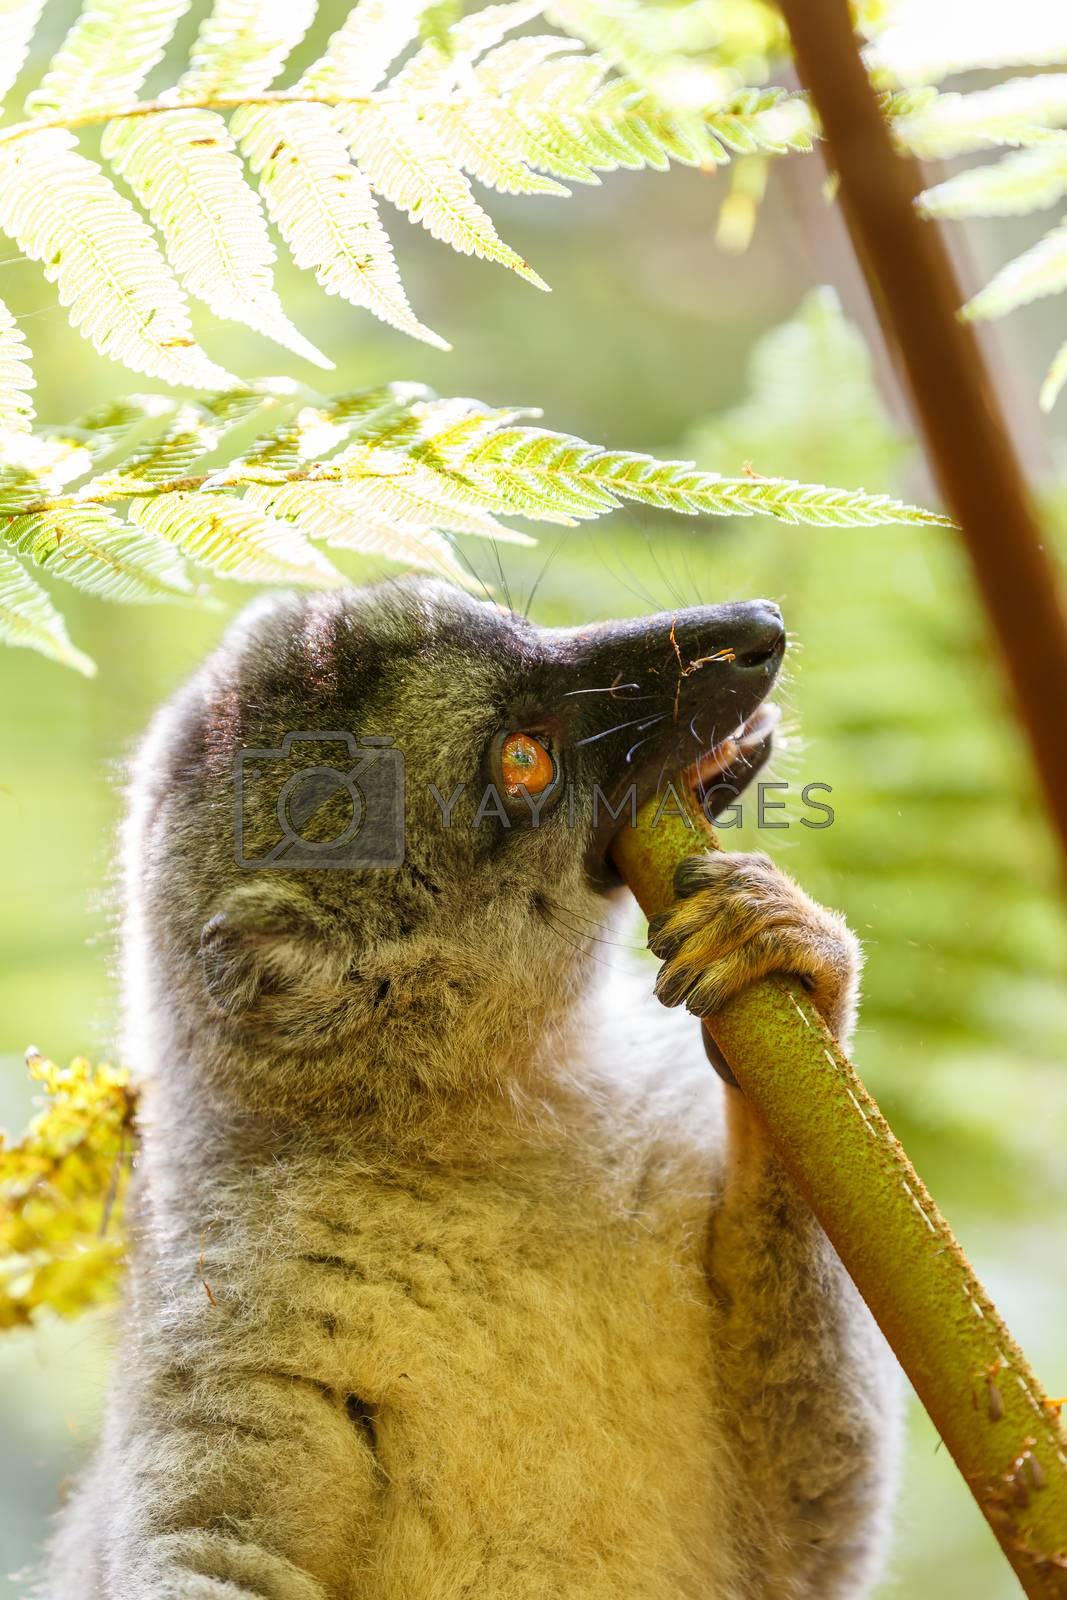 Common brown lemur (Eulemur fulvus) feeding in top of the tree, in natural habitat, Andasibe - Analamazaotra National Park, Madagascar wildlife